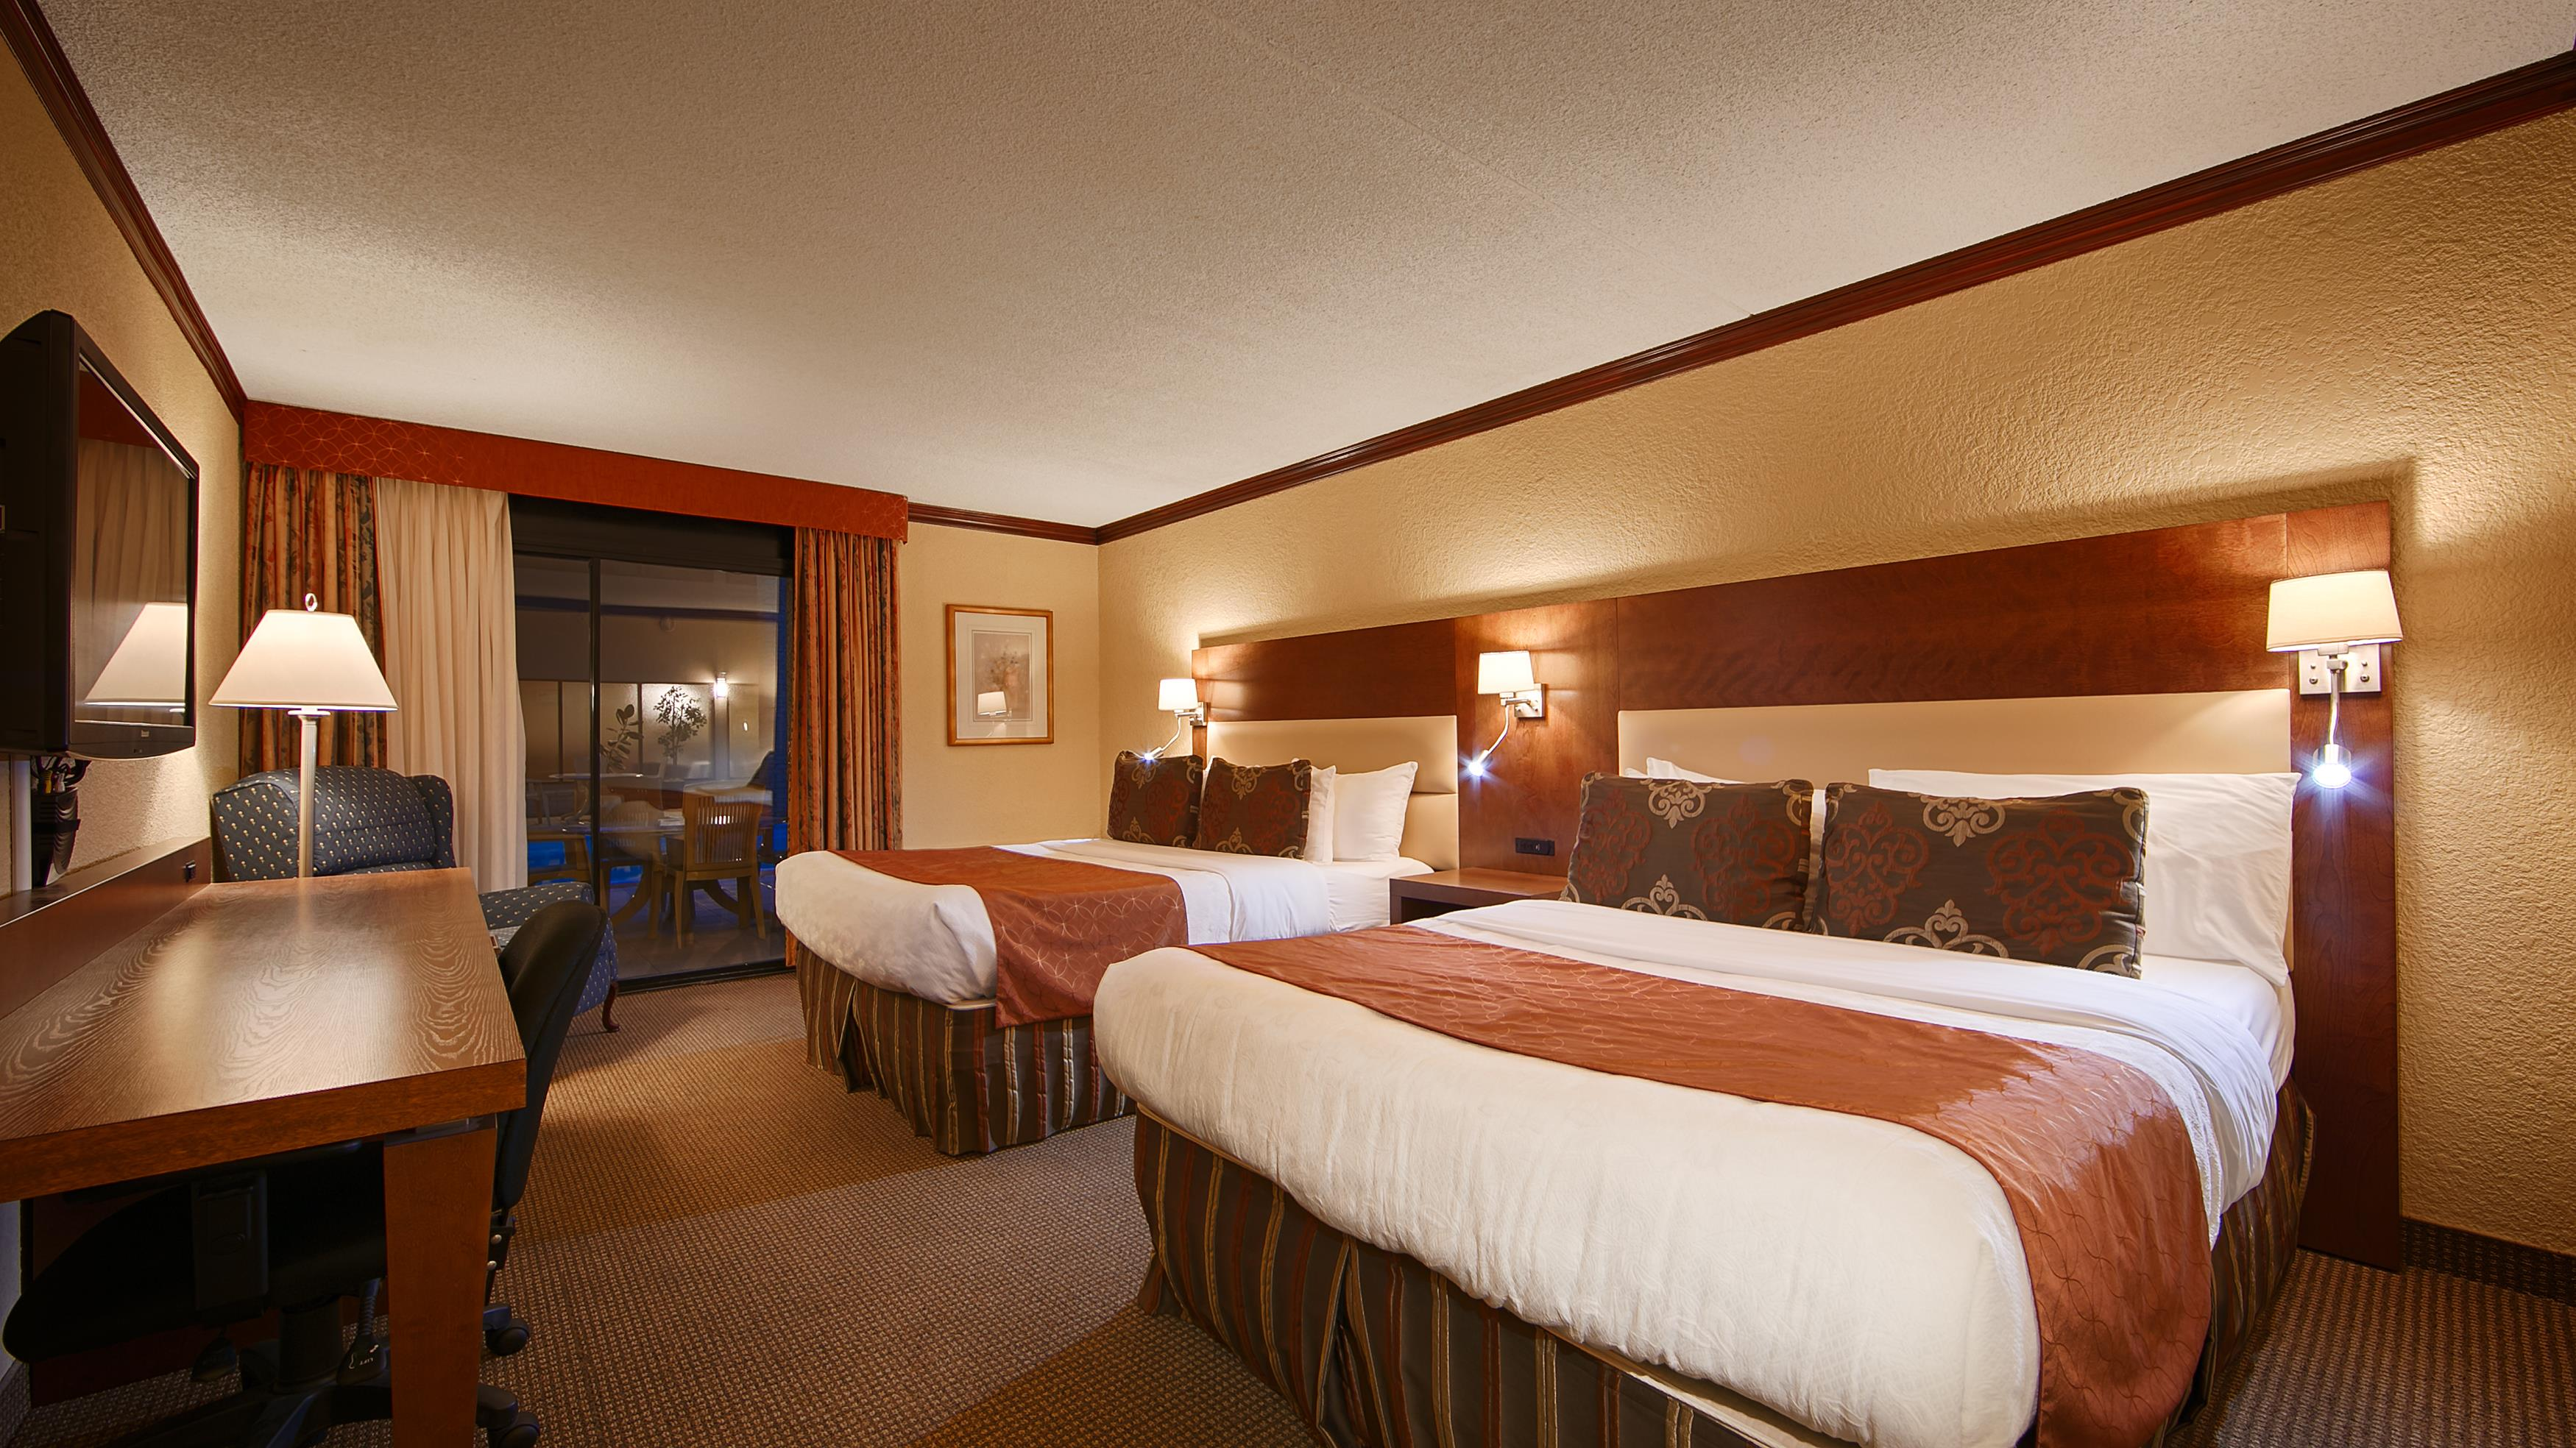 Best Western Hotel Universel Drummondville à Drummondville: 2 Queen Room